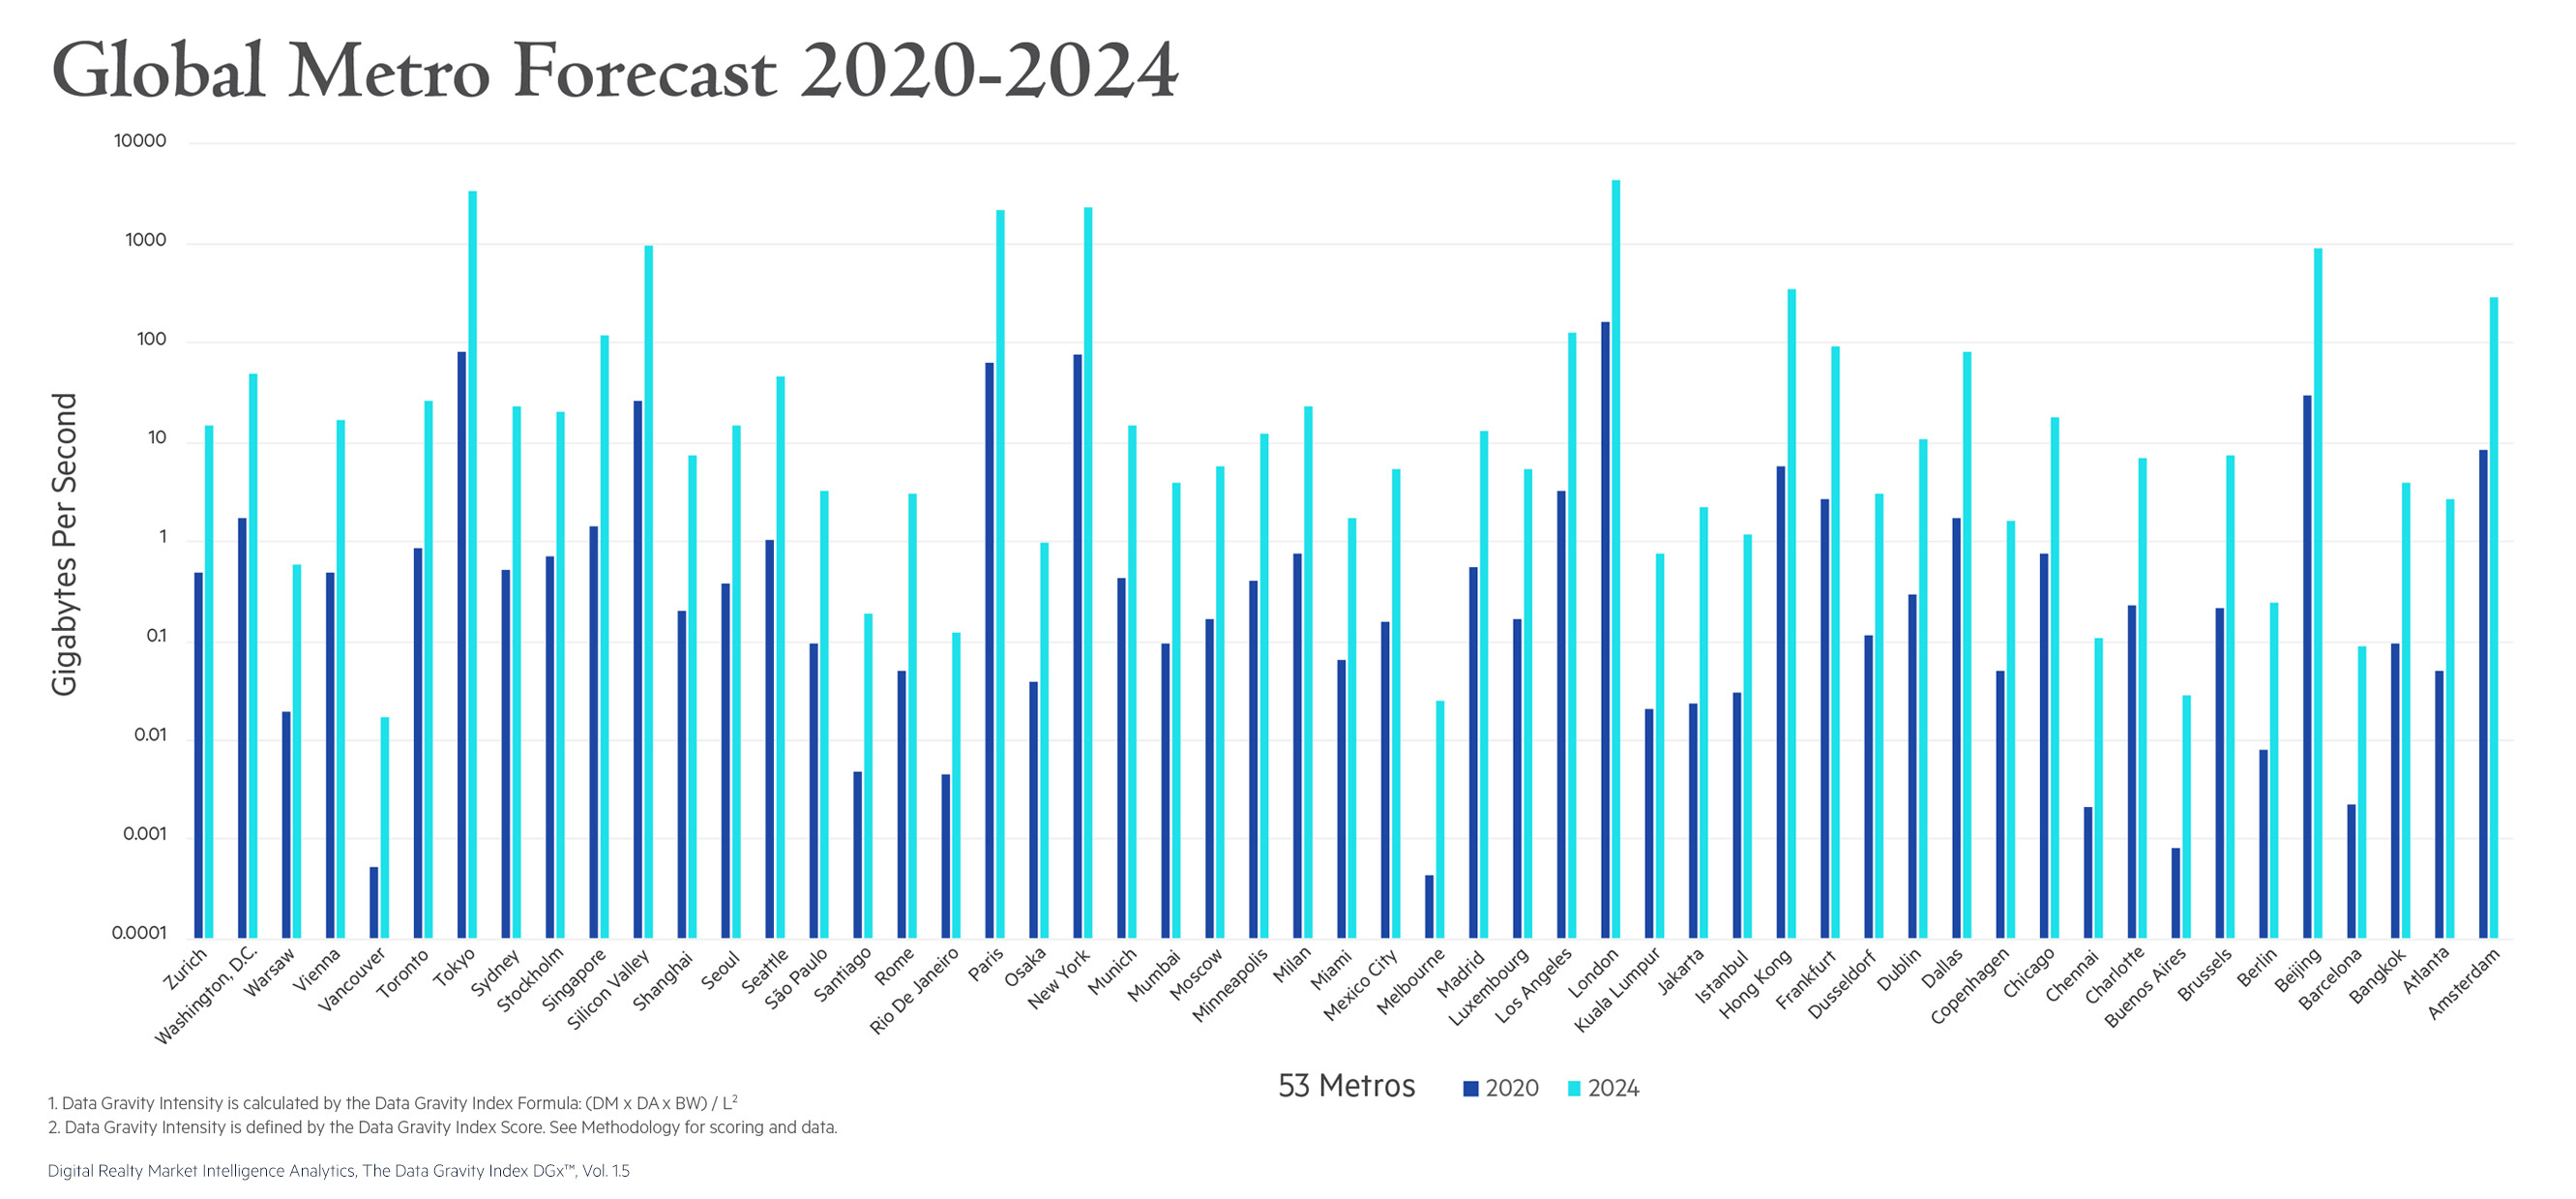 Global Metro Forecast 2020-2024